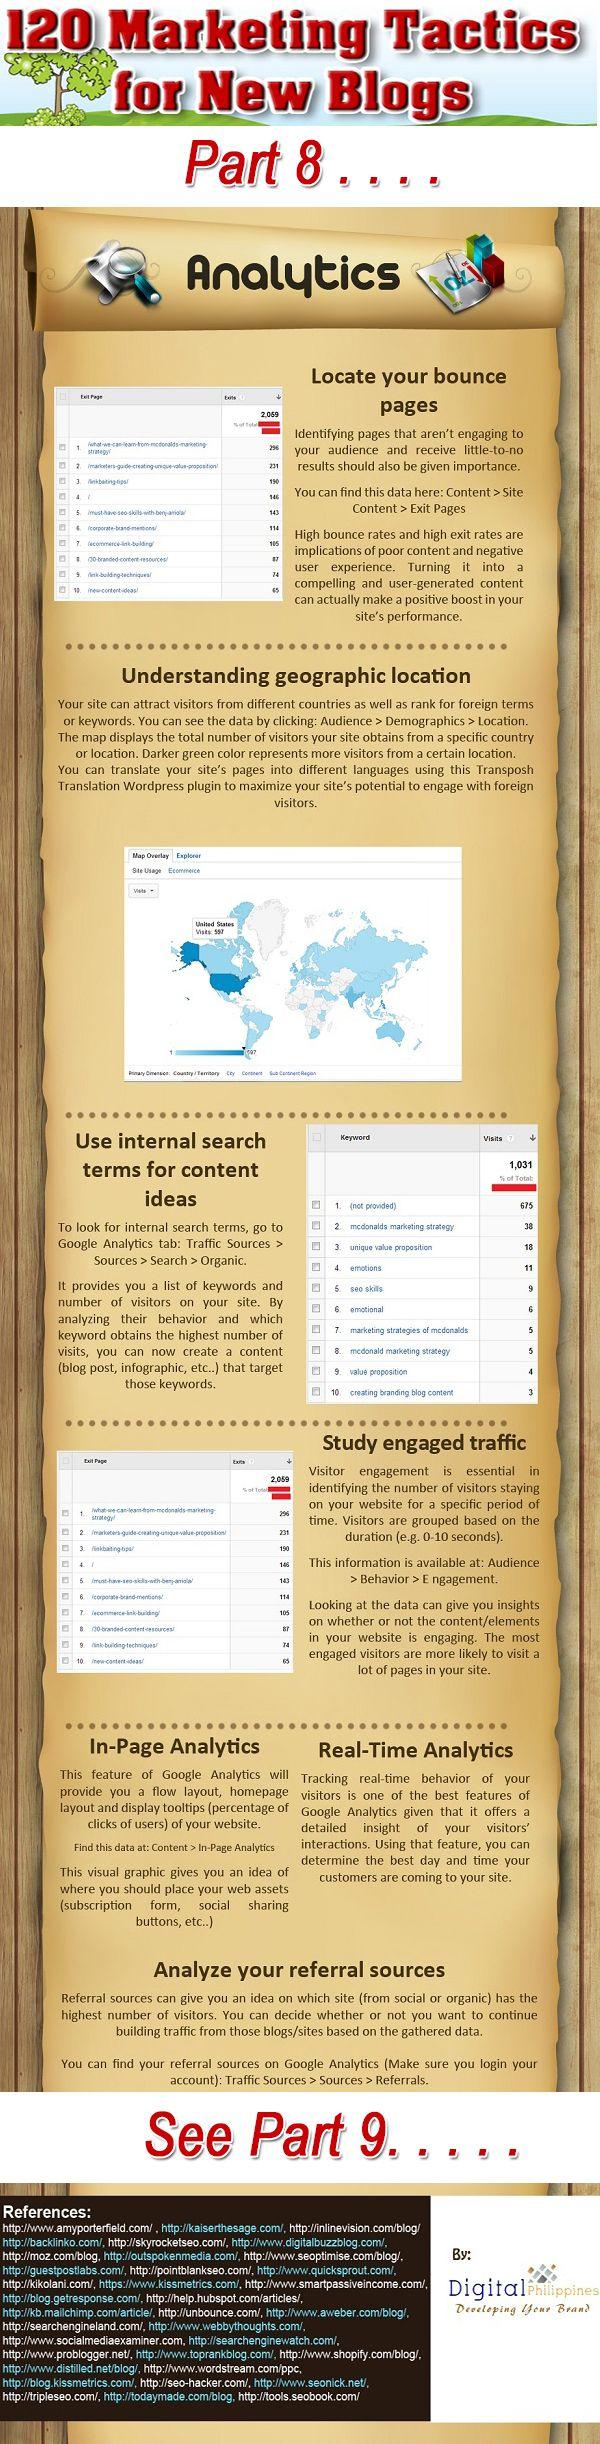 120 tips to promote your #Blog #business #socialmedia  Part 8 of a 9 part series. #infographic www.socialmediamamma.com